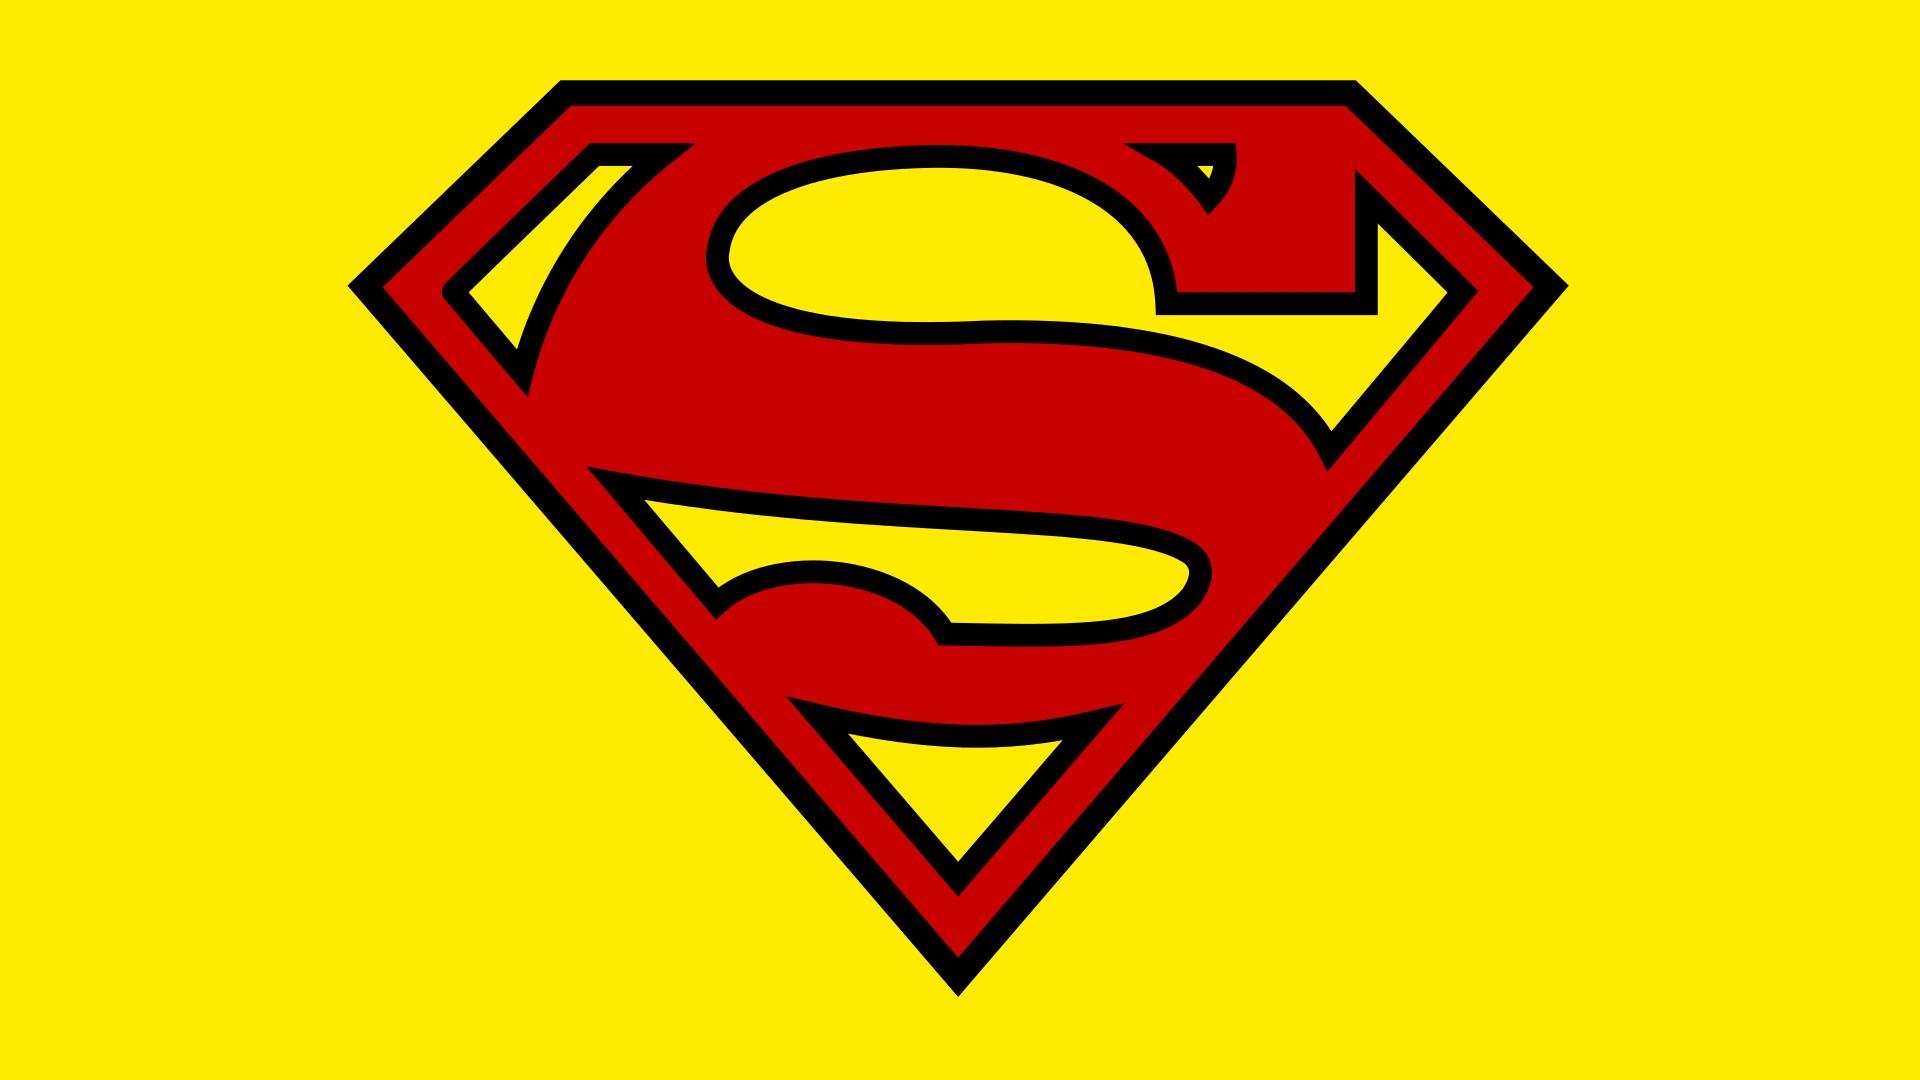 Superman logo histoire et signification, evolution ...